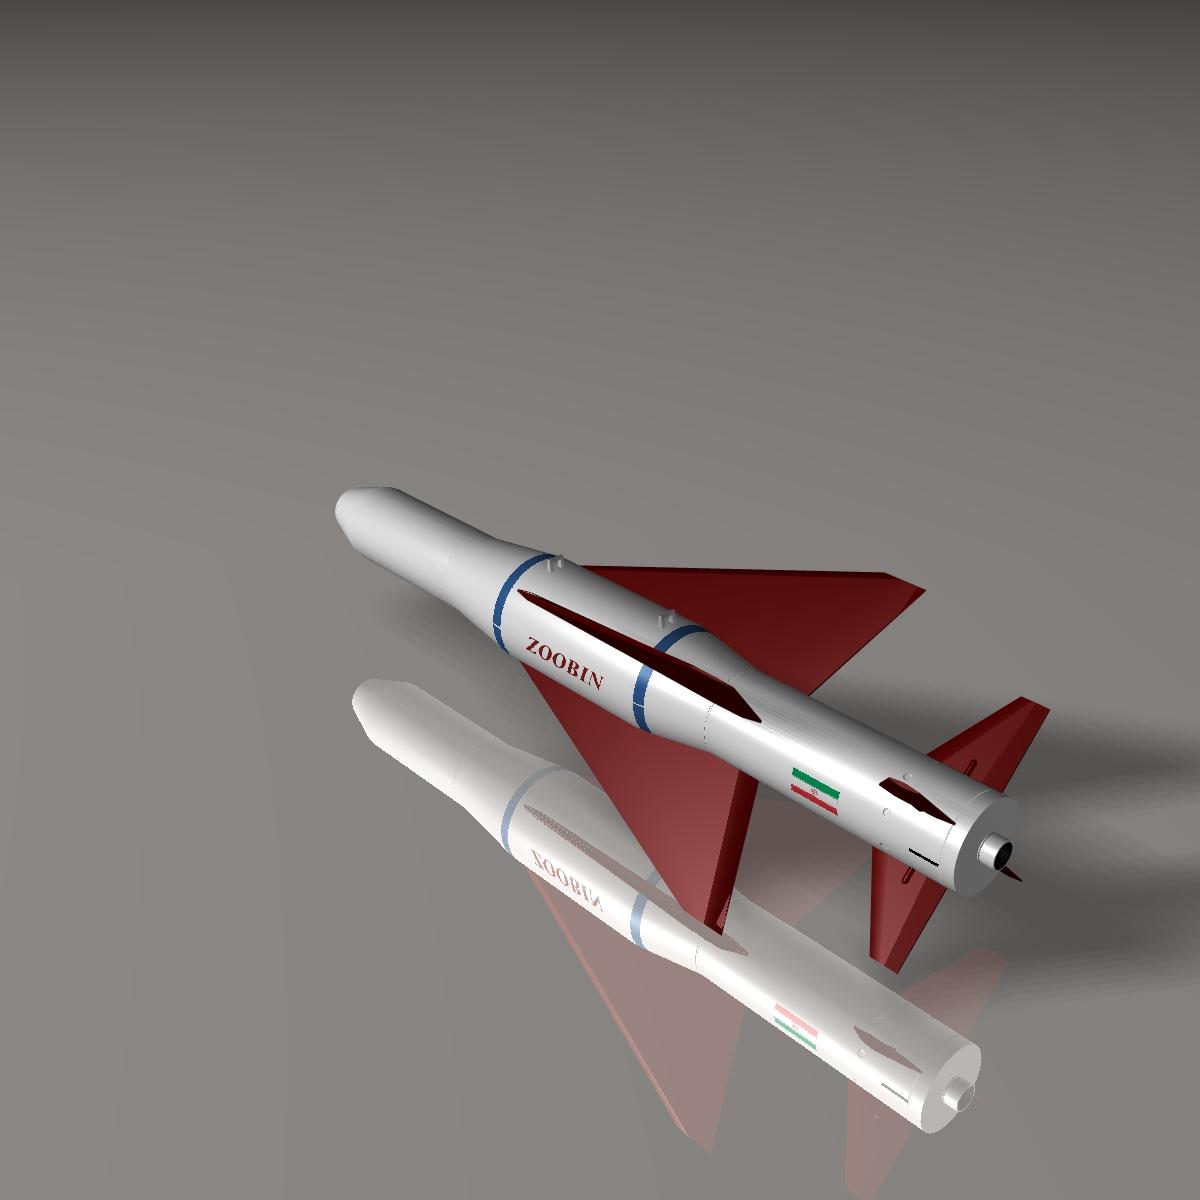 iranian agm-379 zoobin asm missile 3d model 3ds dxf fbx blend cob dae x obj 150589